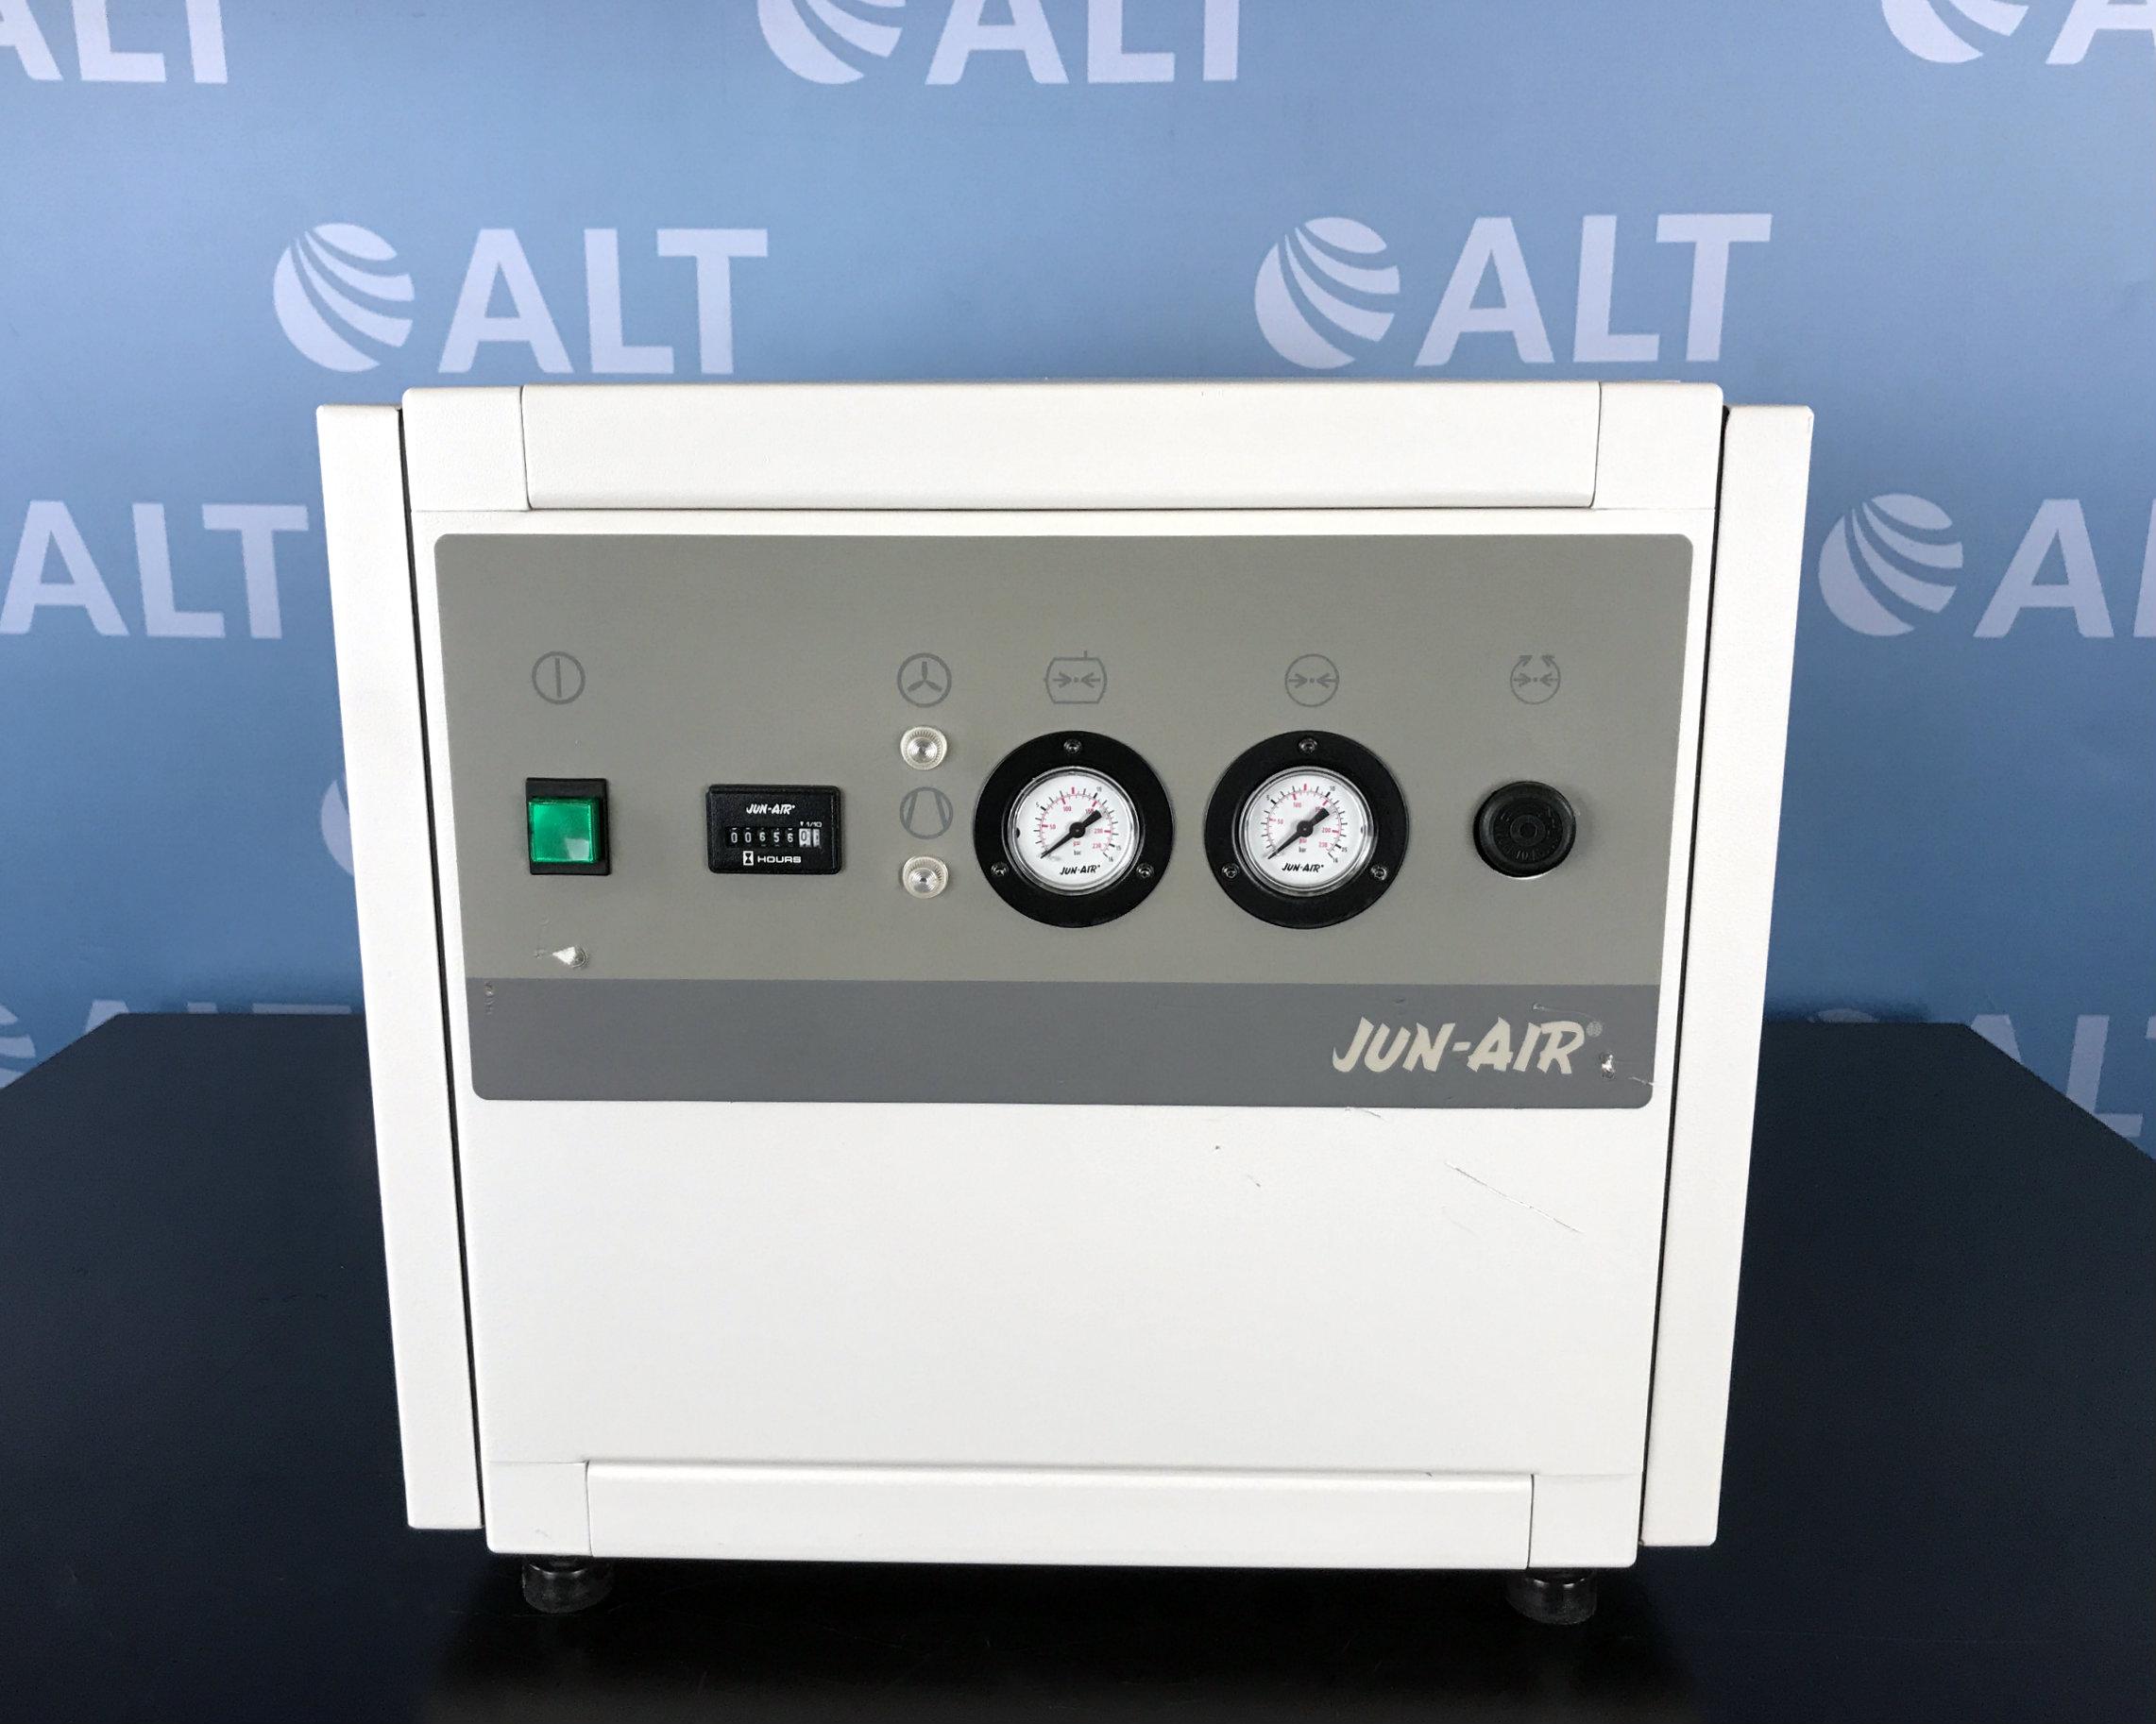 Jun-Air Compressor Model OF302-4M Image